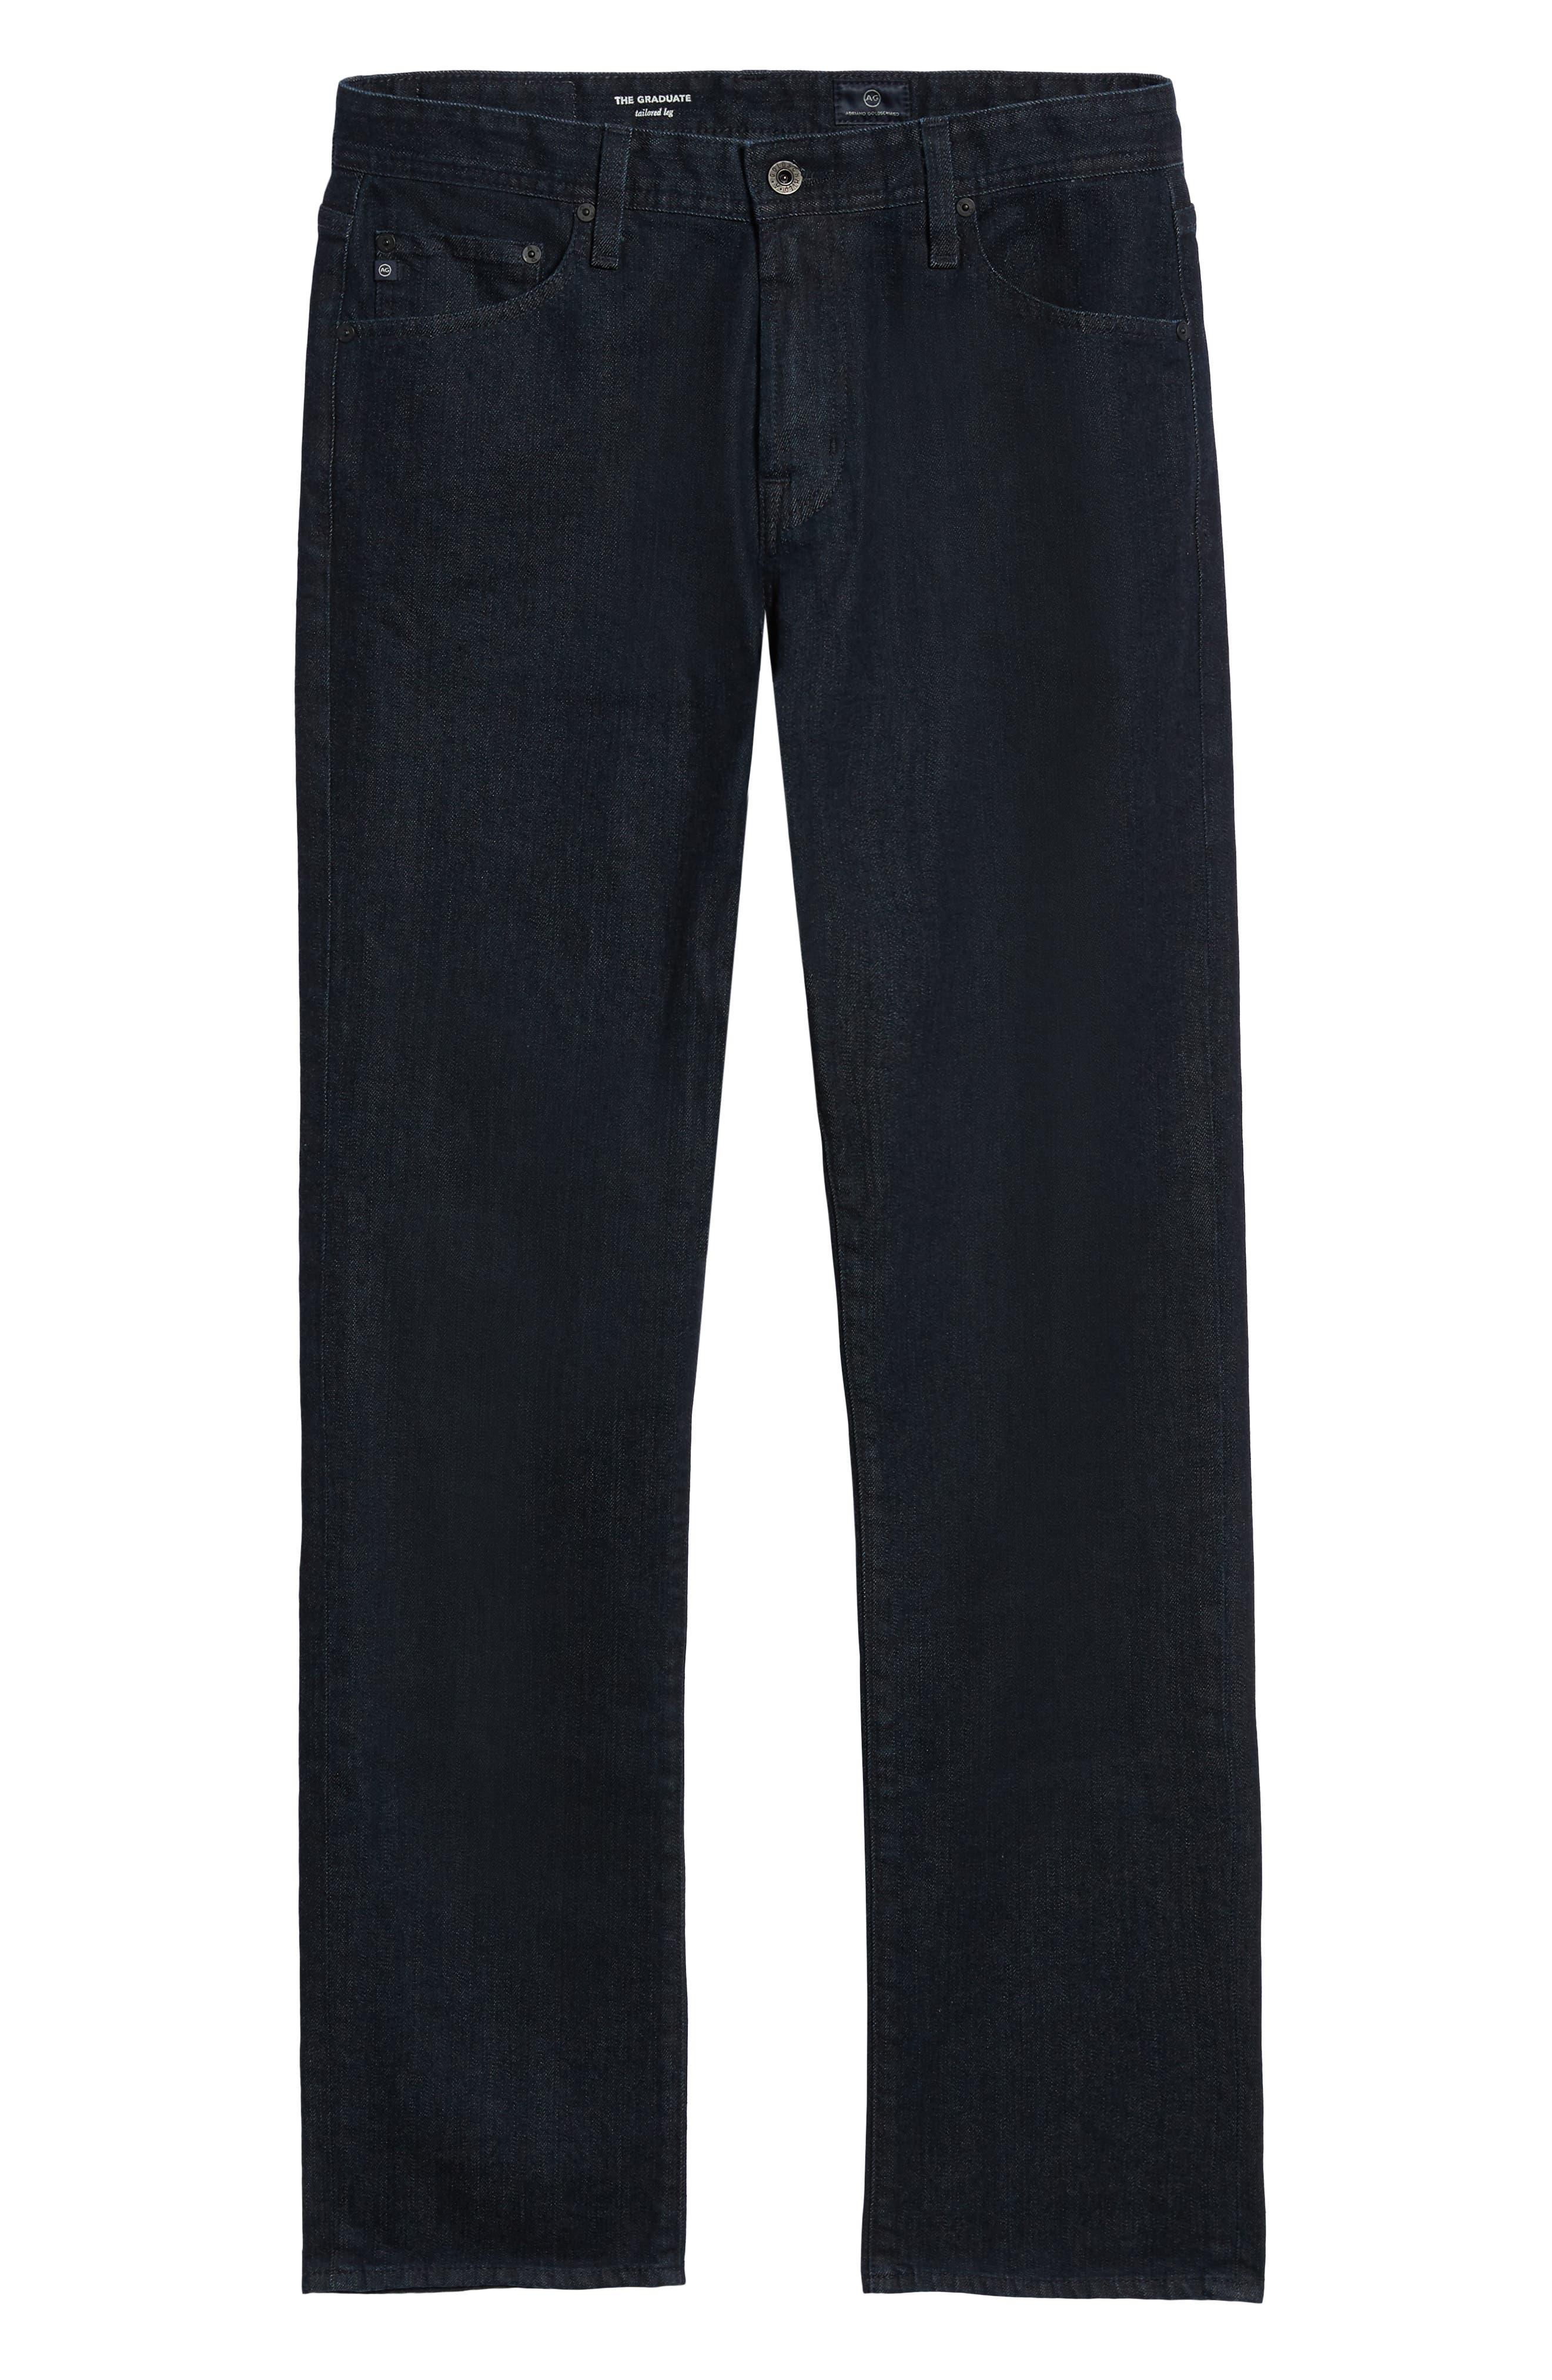 Graduate Slim Straight Leg Jeans,                             Alternate thumbnail 6, color,                             STELLAR